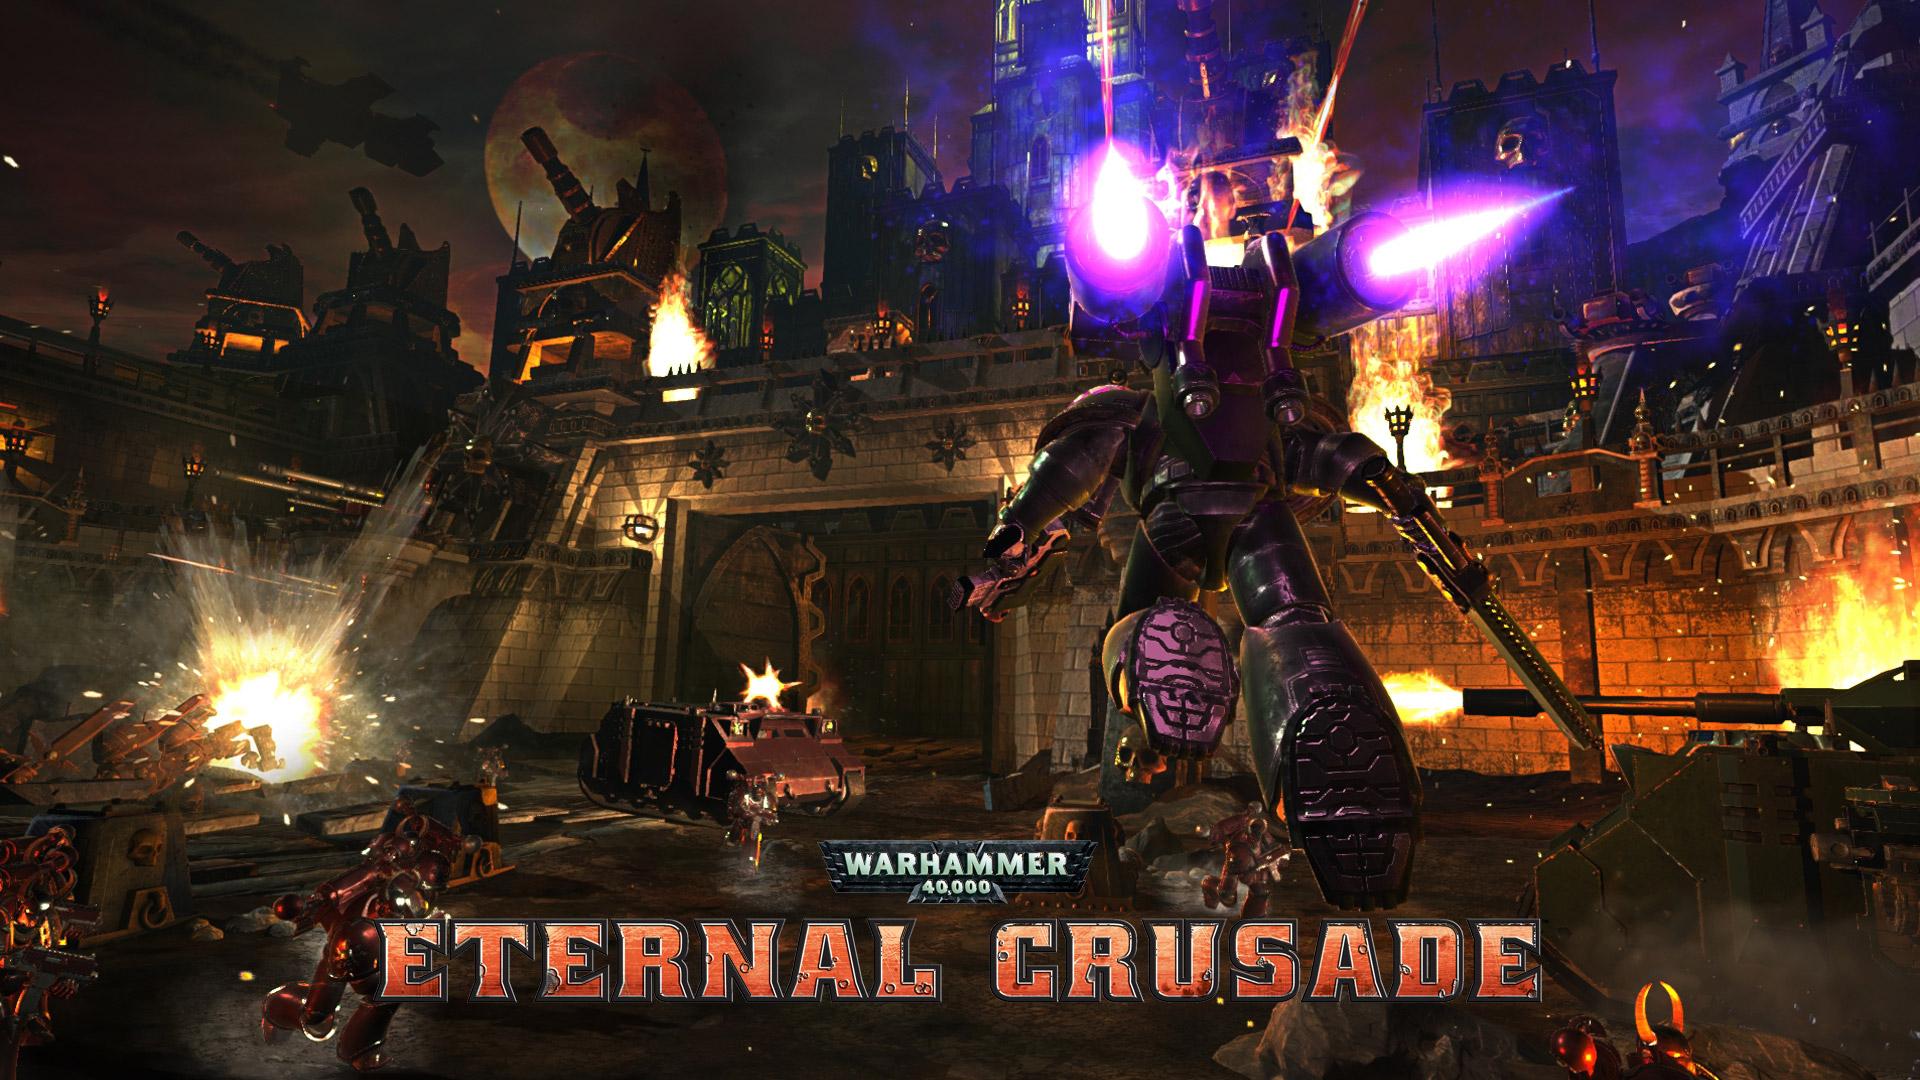 Warhammer 40,000: Eternal Crusade Wallpaper in 1920x1080